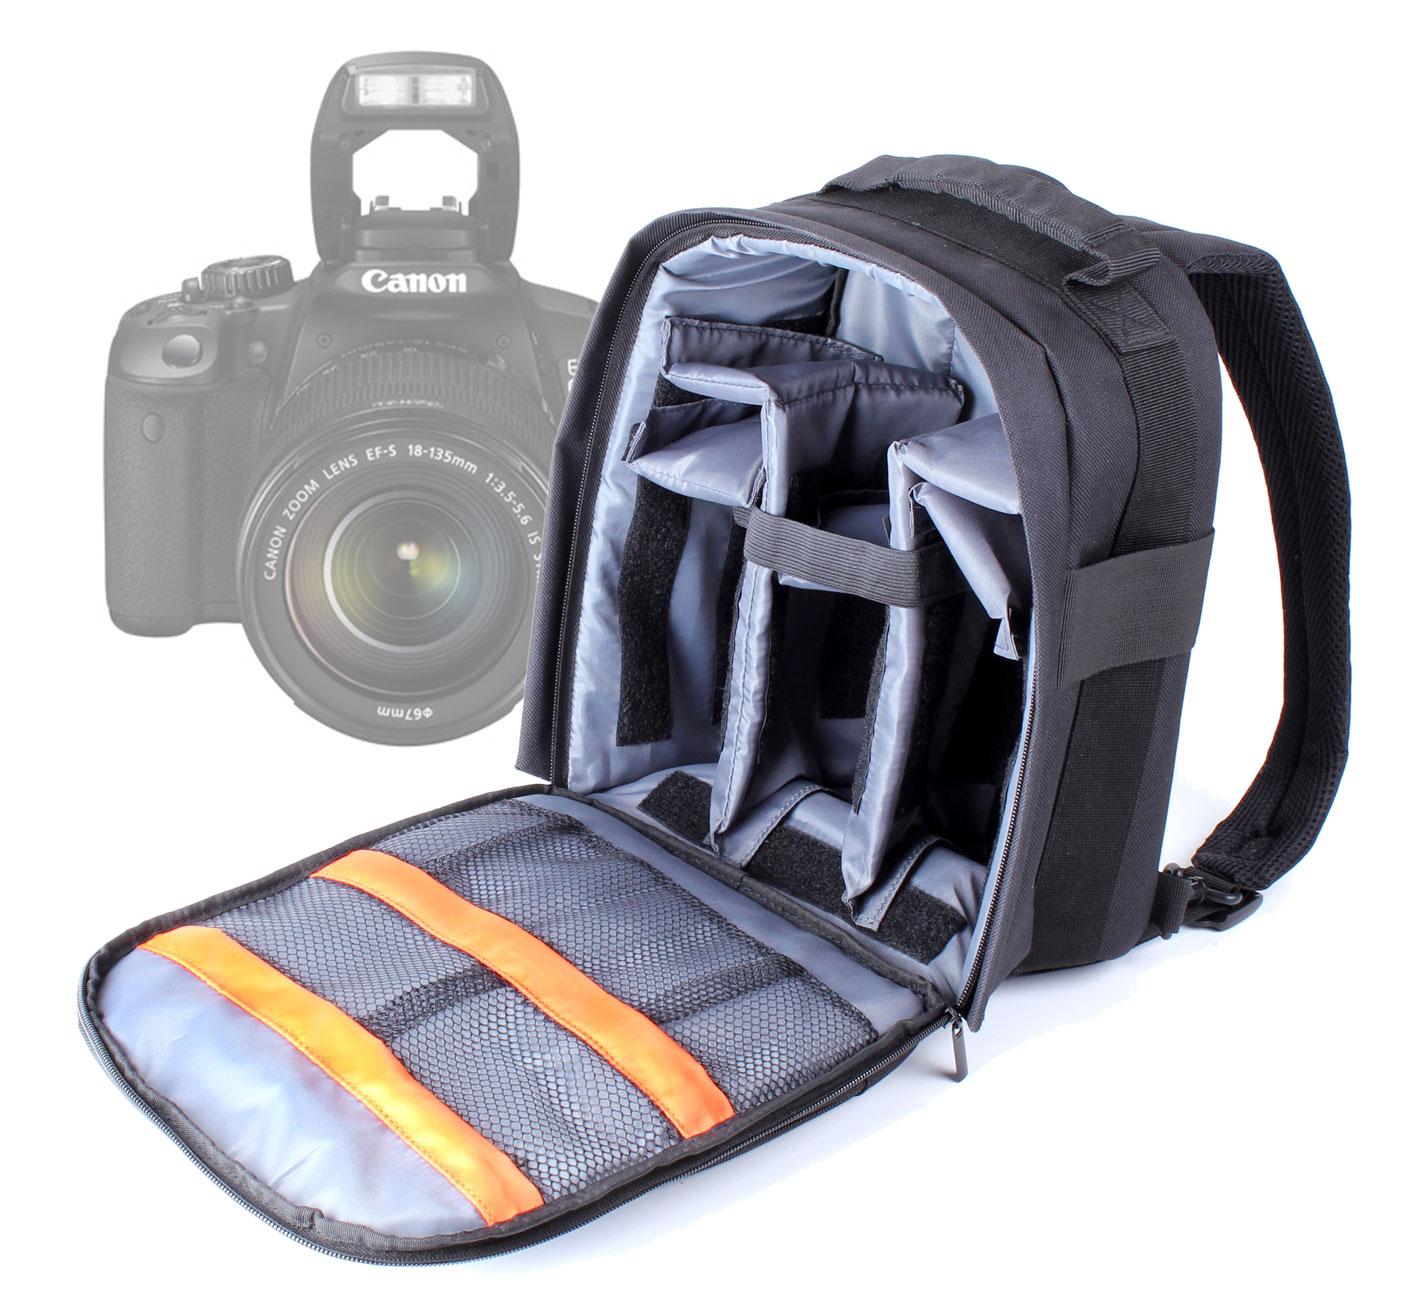 de transport pour appareil photo Panasonic Lumix DMC FZ72 et DMC LZ30E